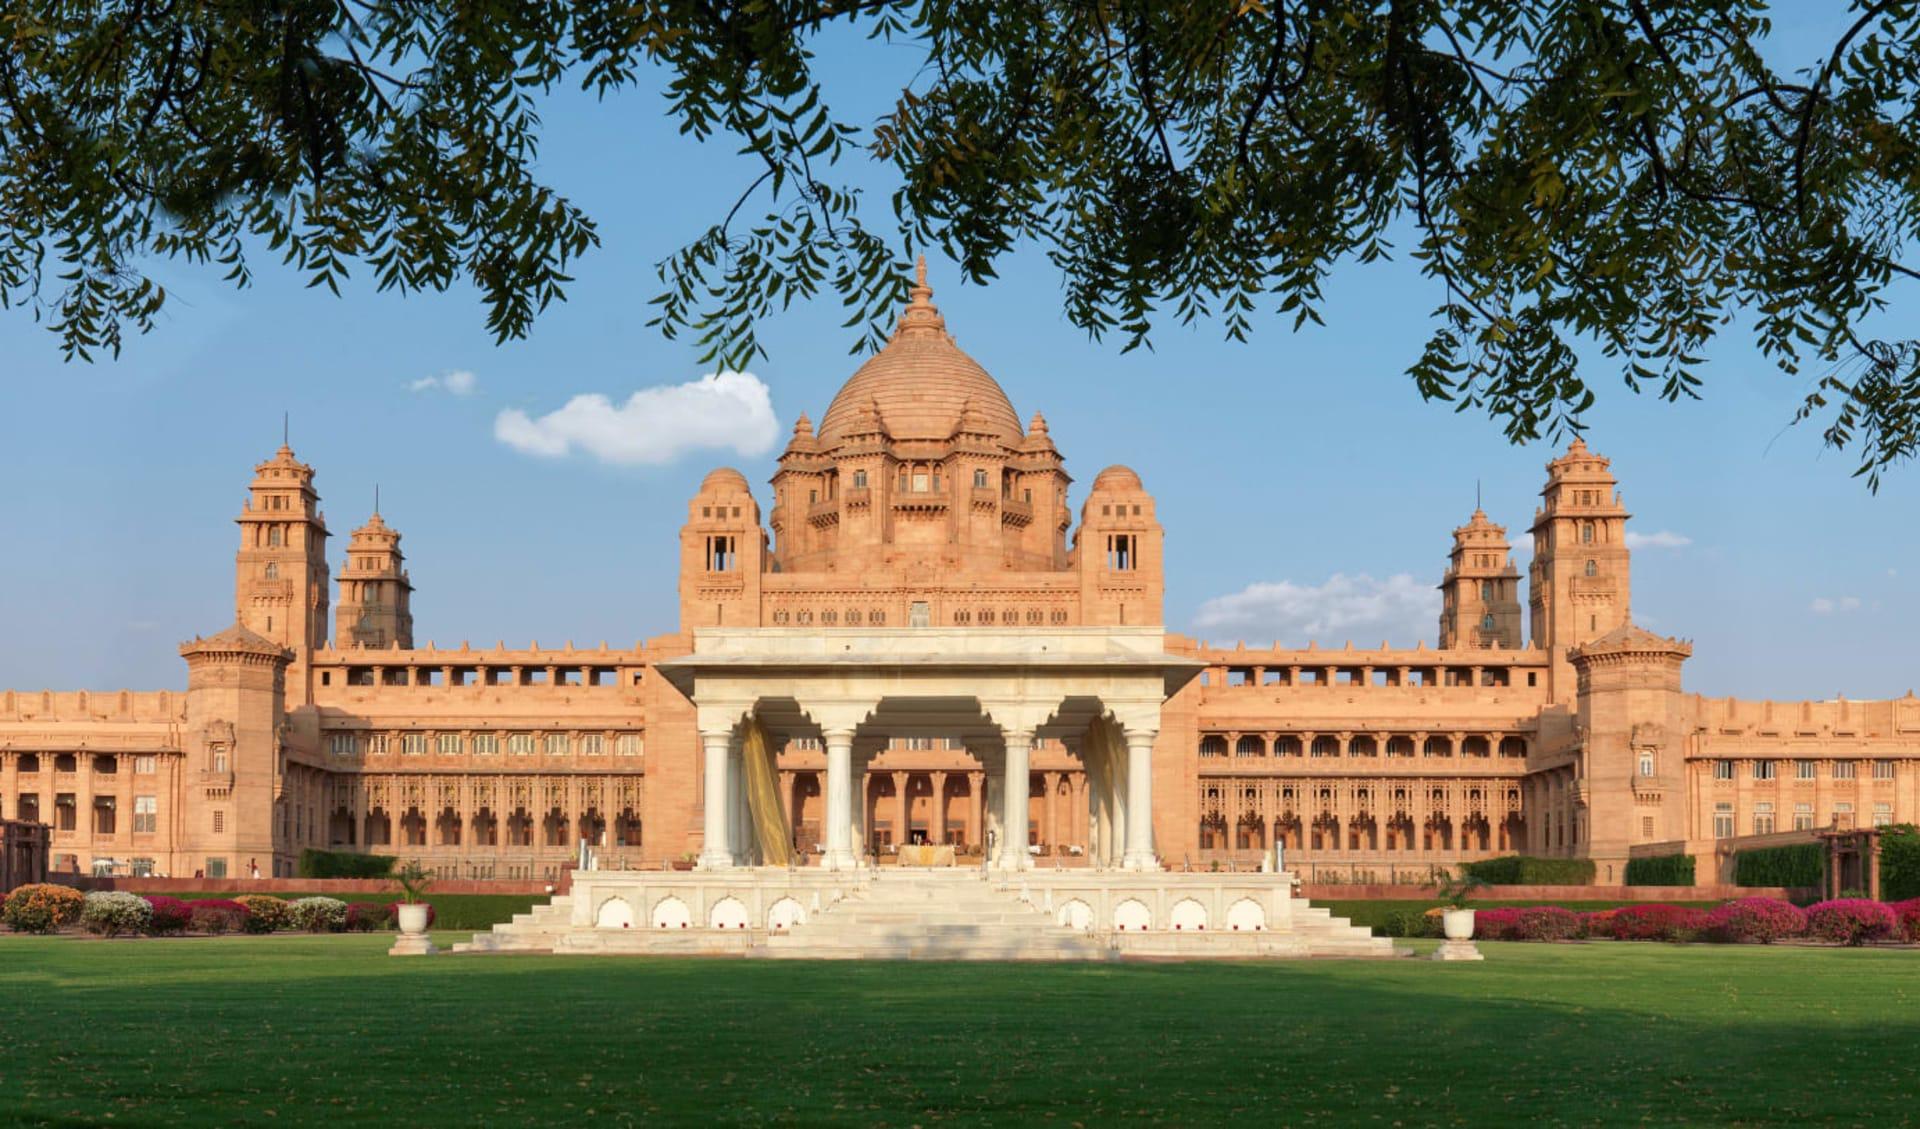 Umaid Bhawan Palace in Jodhpur: